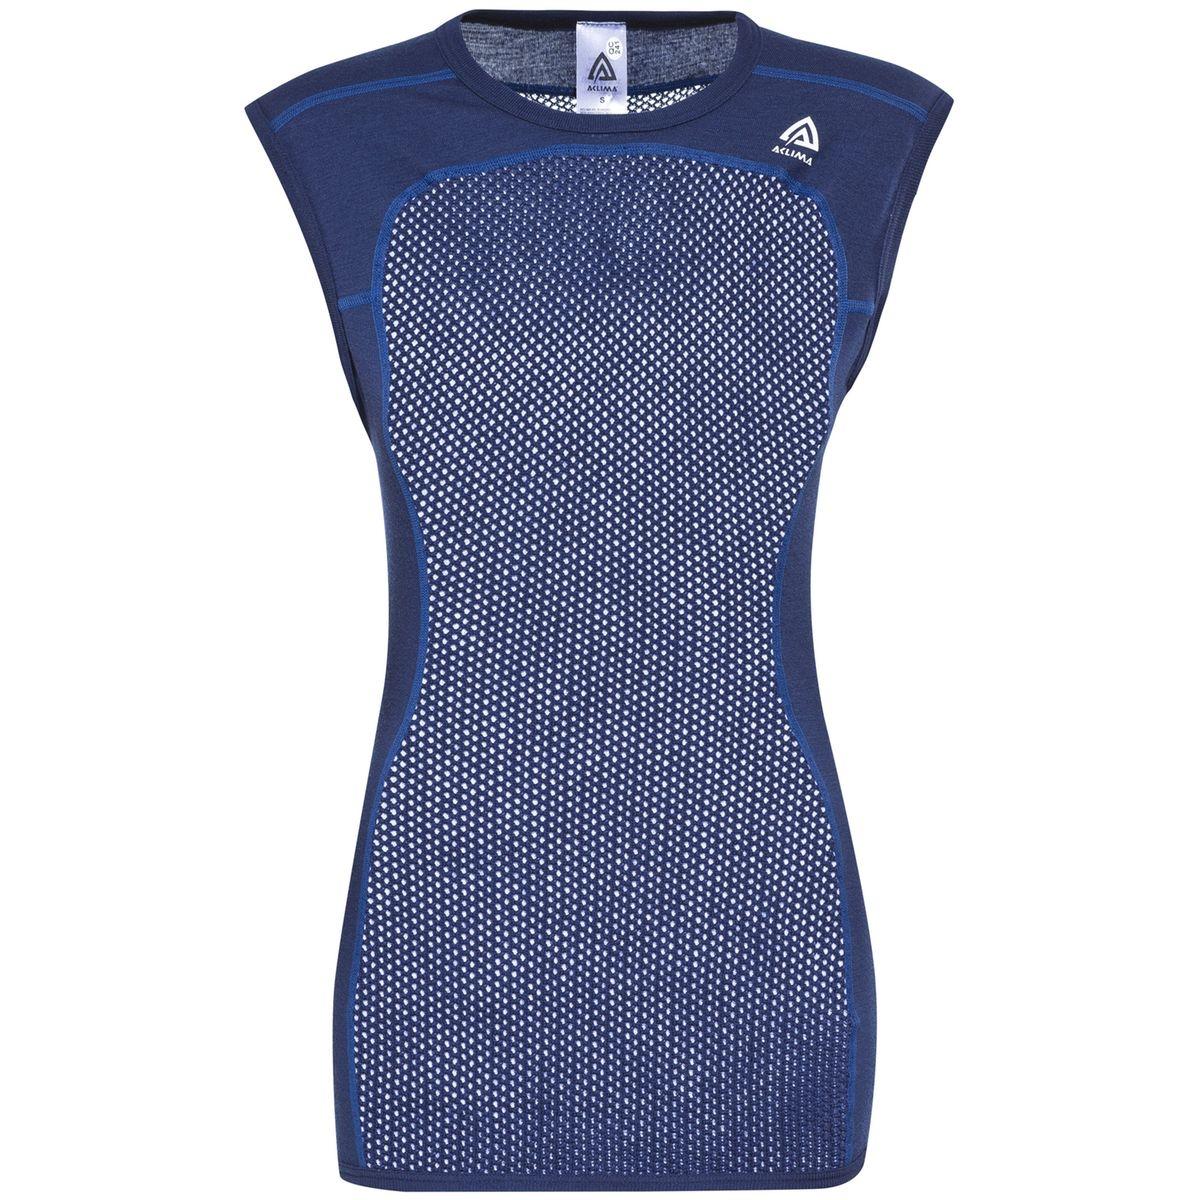 Coolnet - Sous-vêtement - bleu